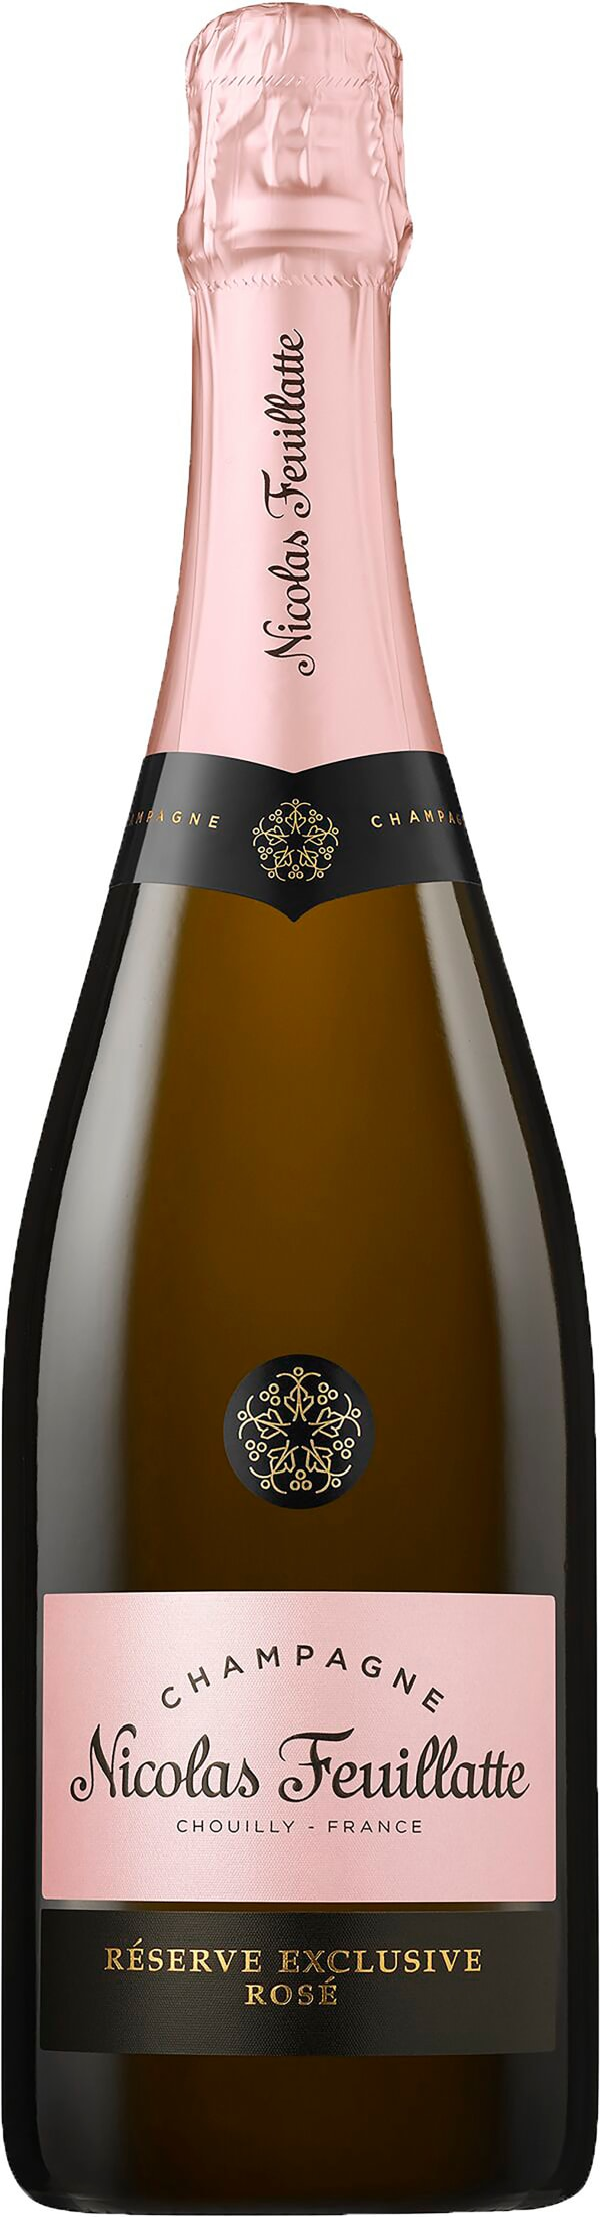 Nicolas Feuillatte Réserve Exclusive Rosé Champagne Brut presentförpackning